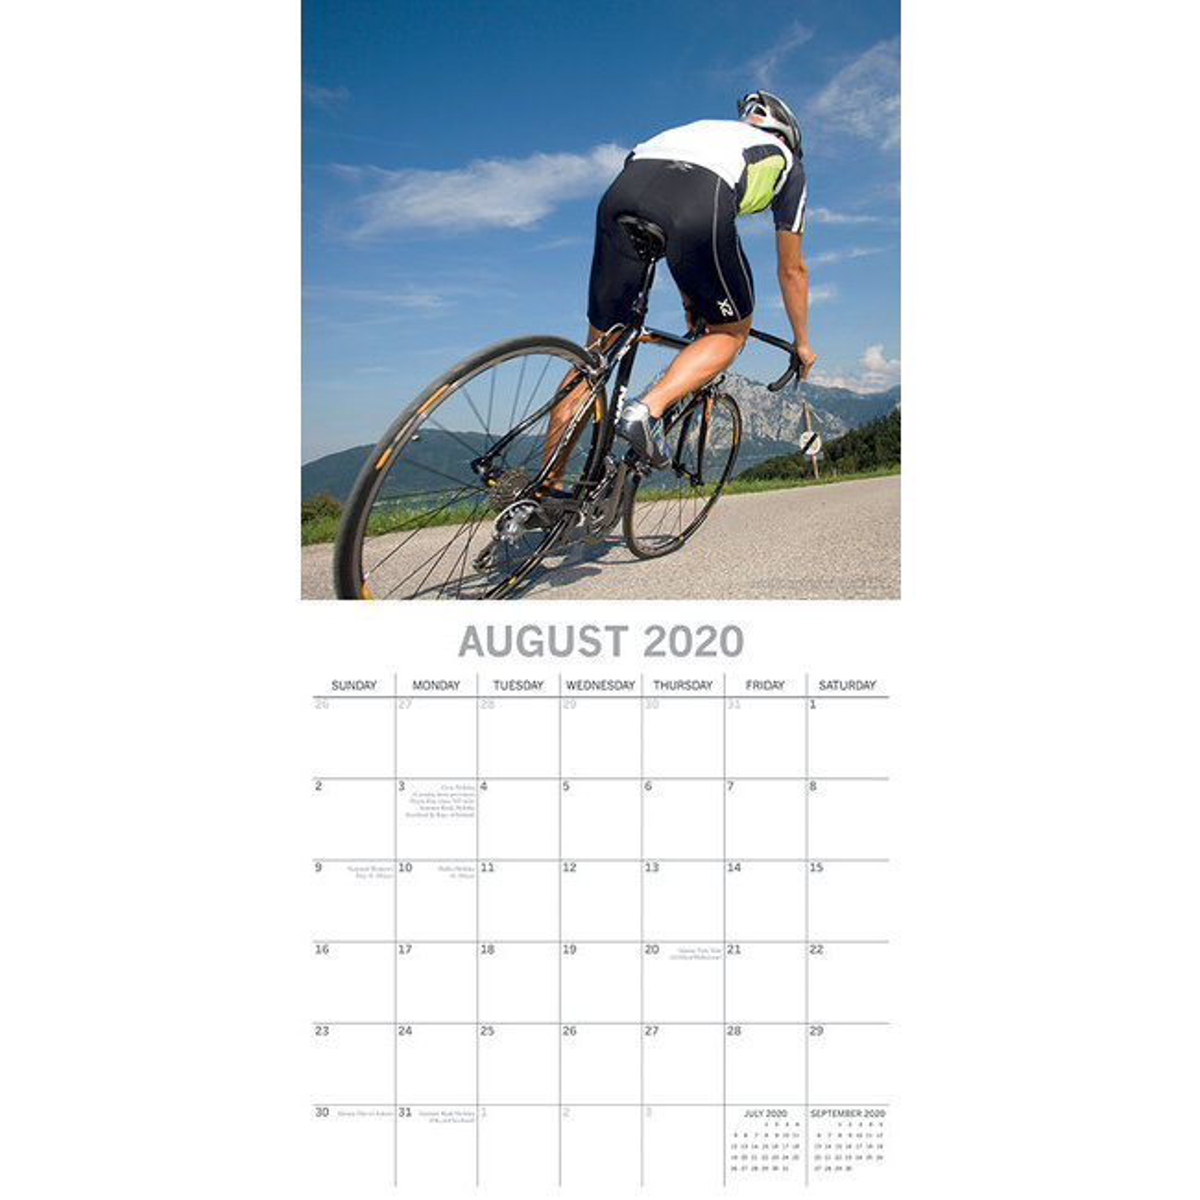 Calendrier Cyclo 2020.Calendrier 2020 Cyclisme